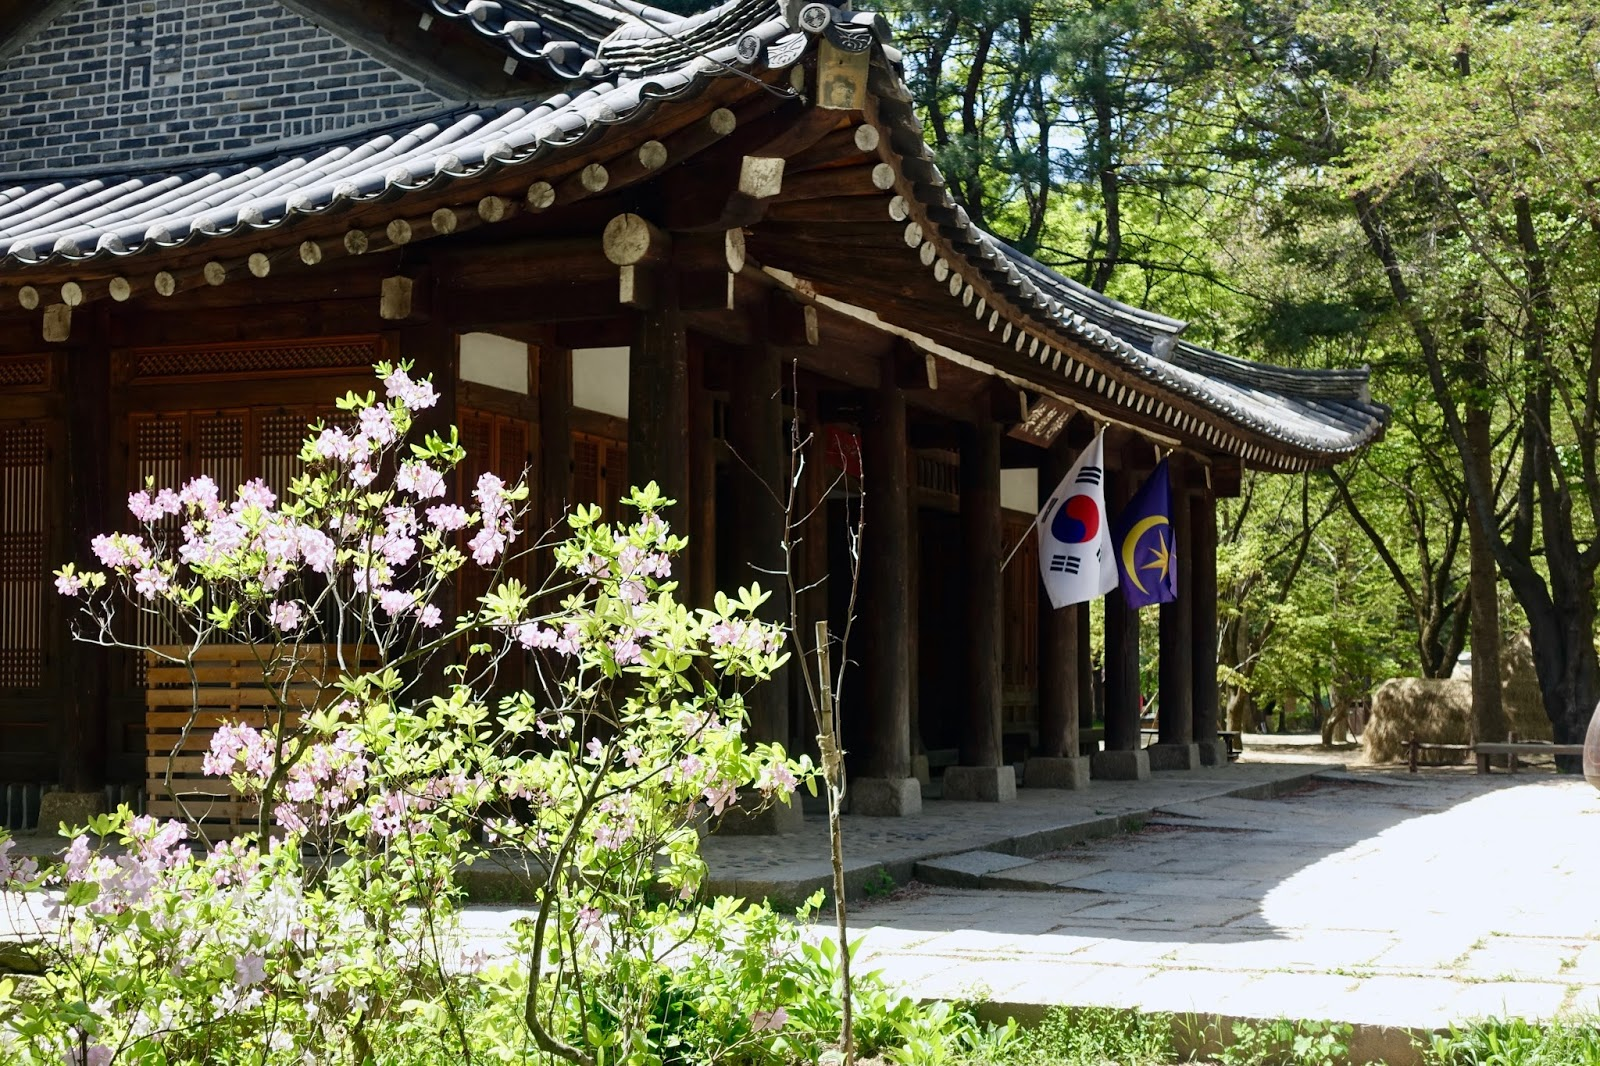 NAMI ISLAND, KOREA spring